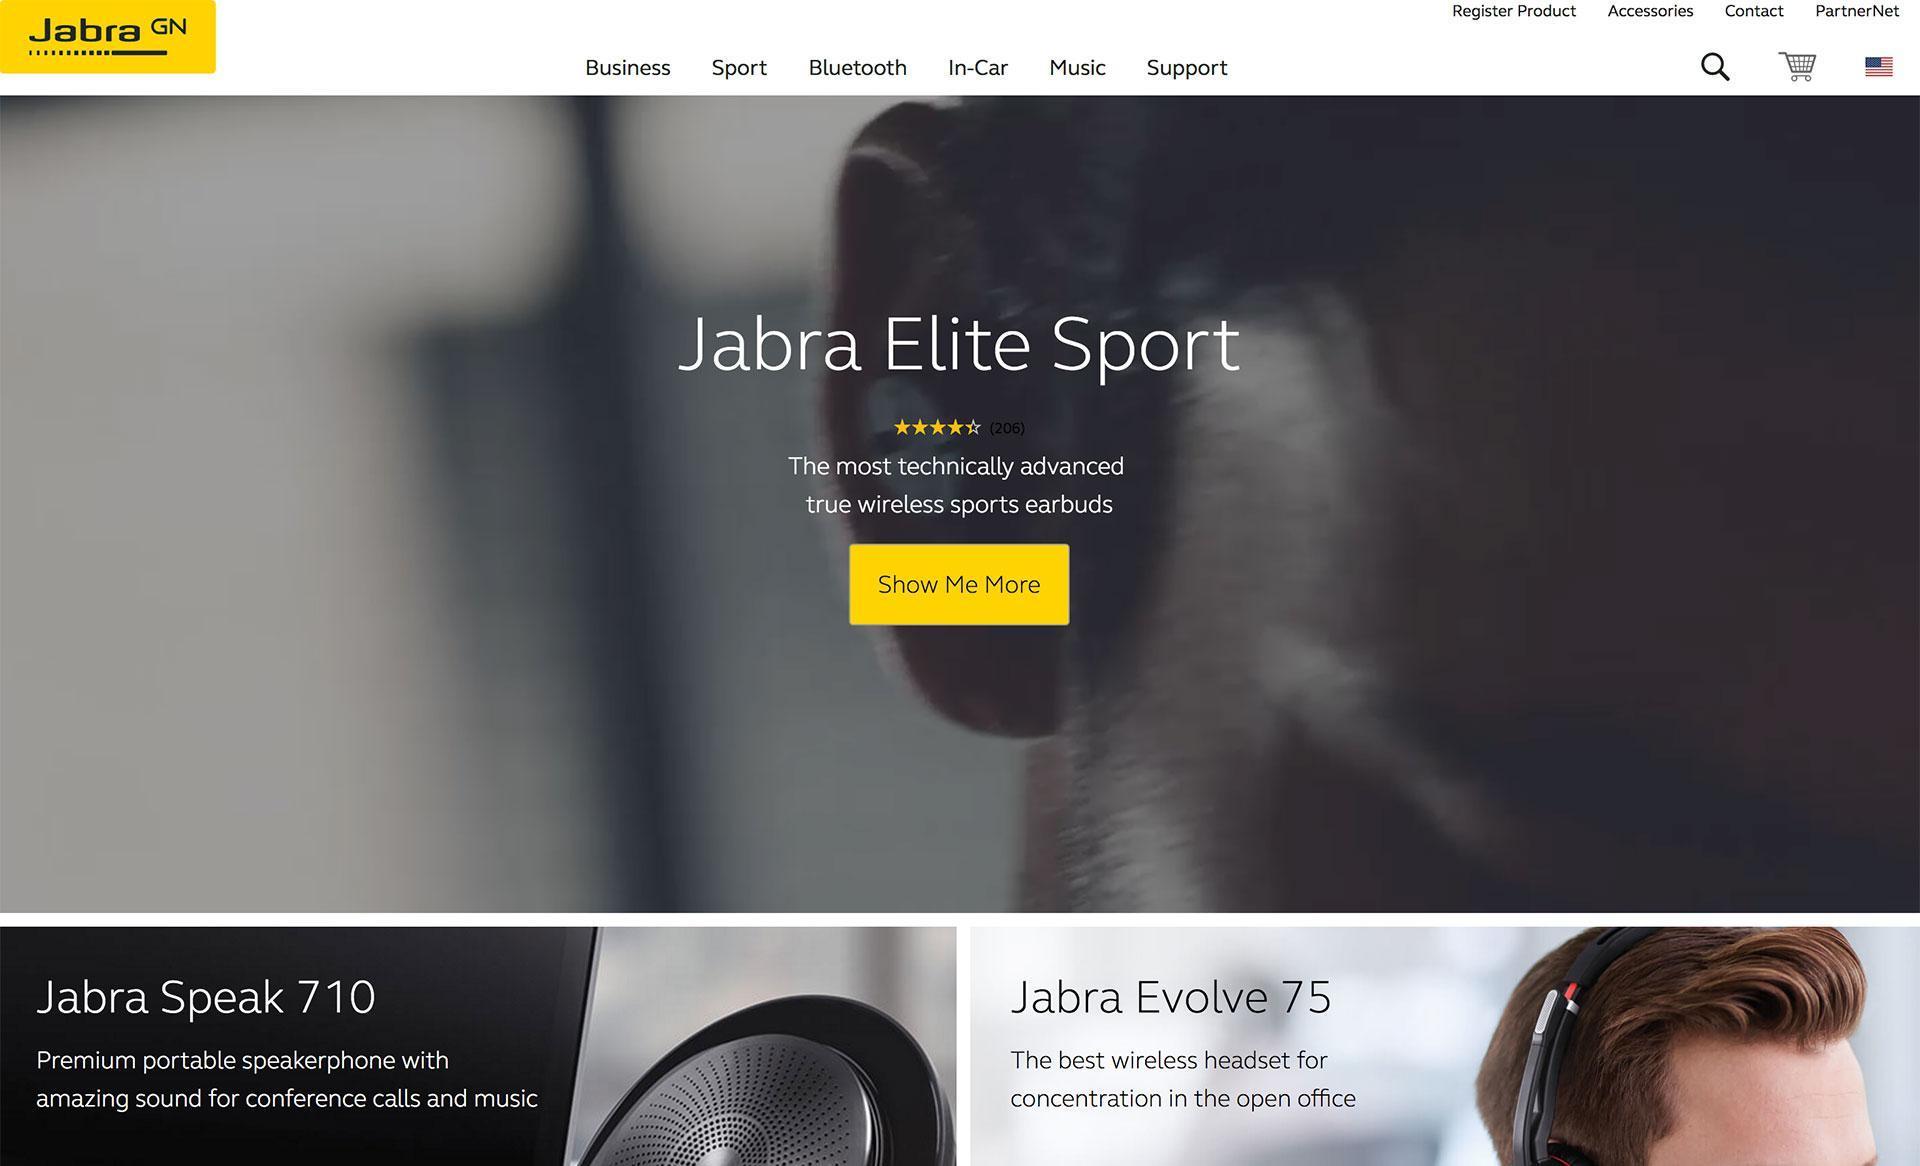 JABRA Bluetooth Earbuds